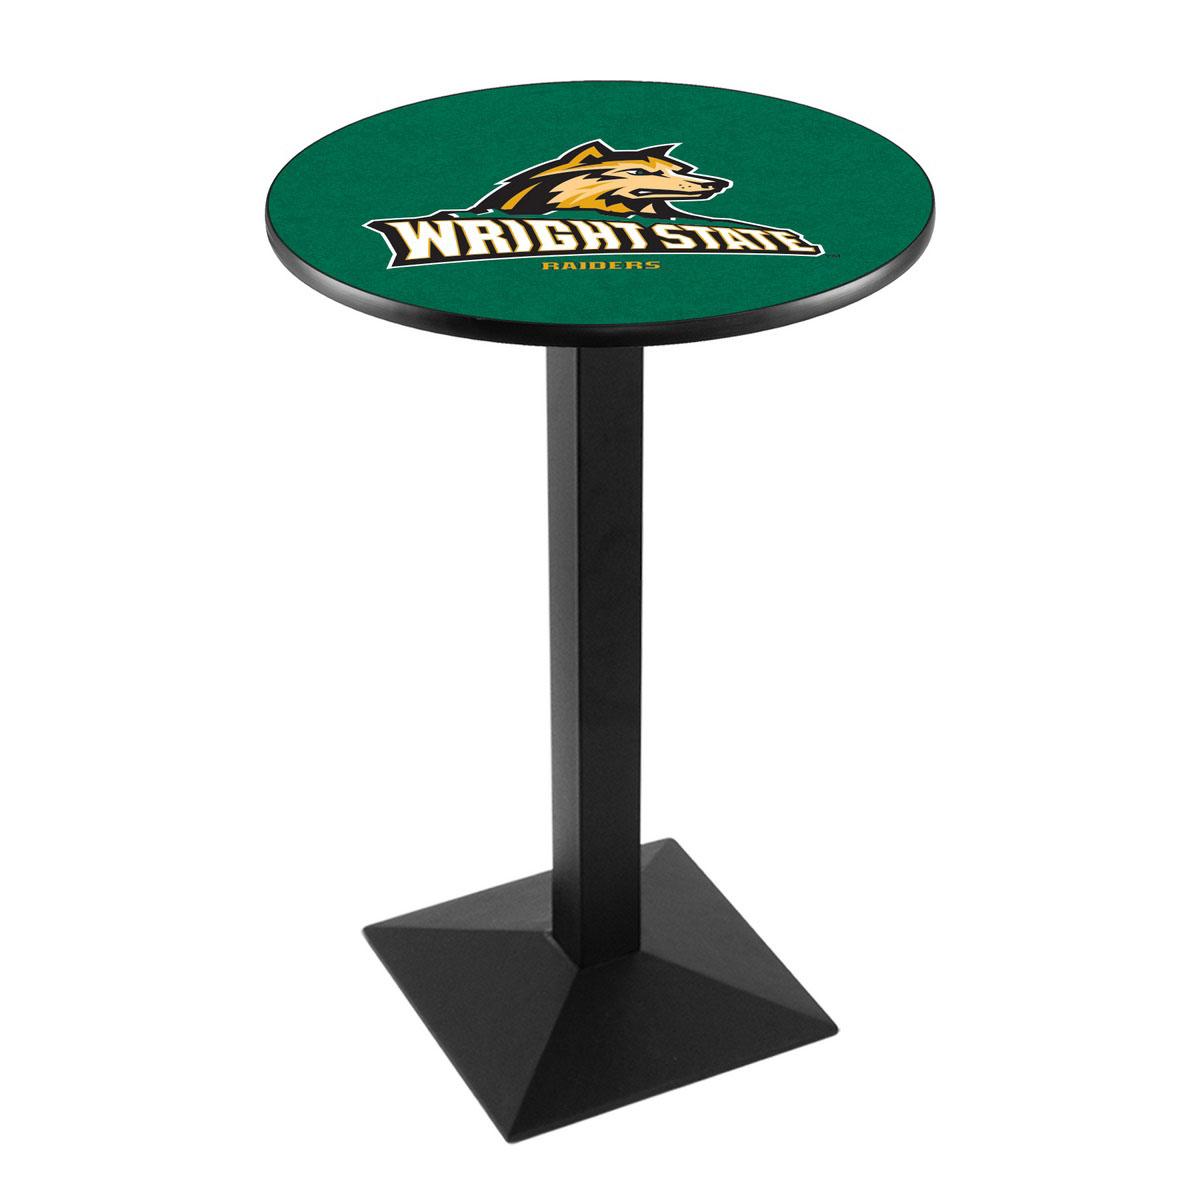 Wonderful Wright State University Logo Pub Bar Table Square Stand Product Photo